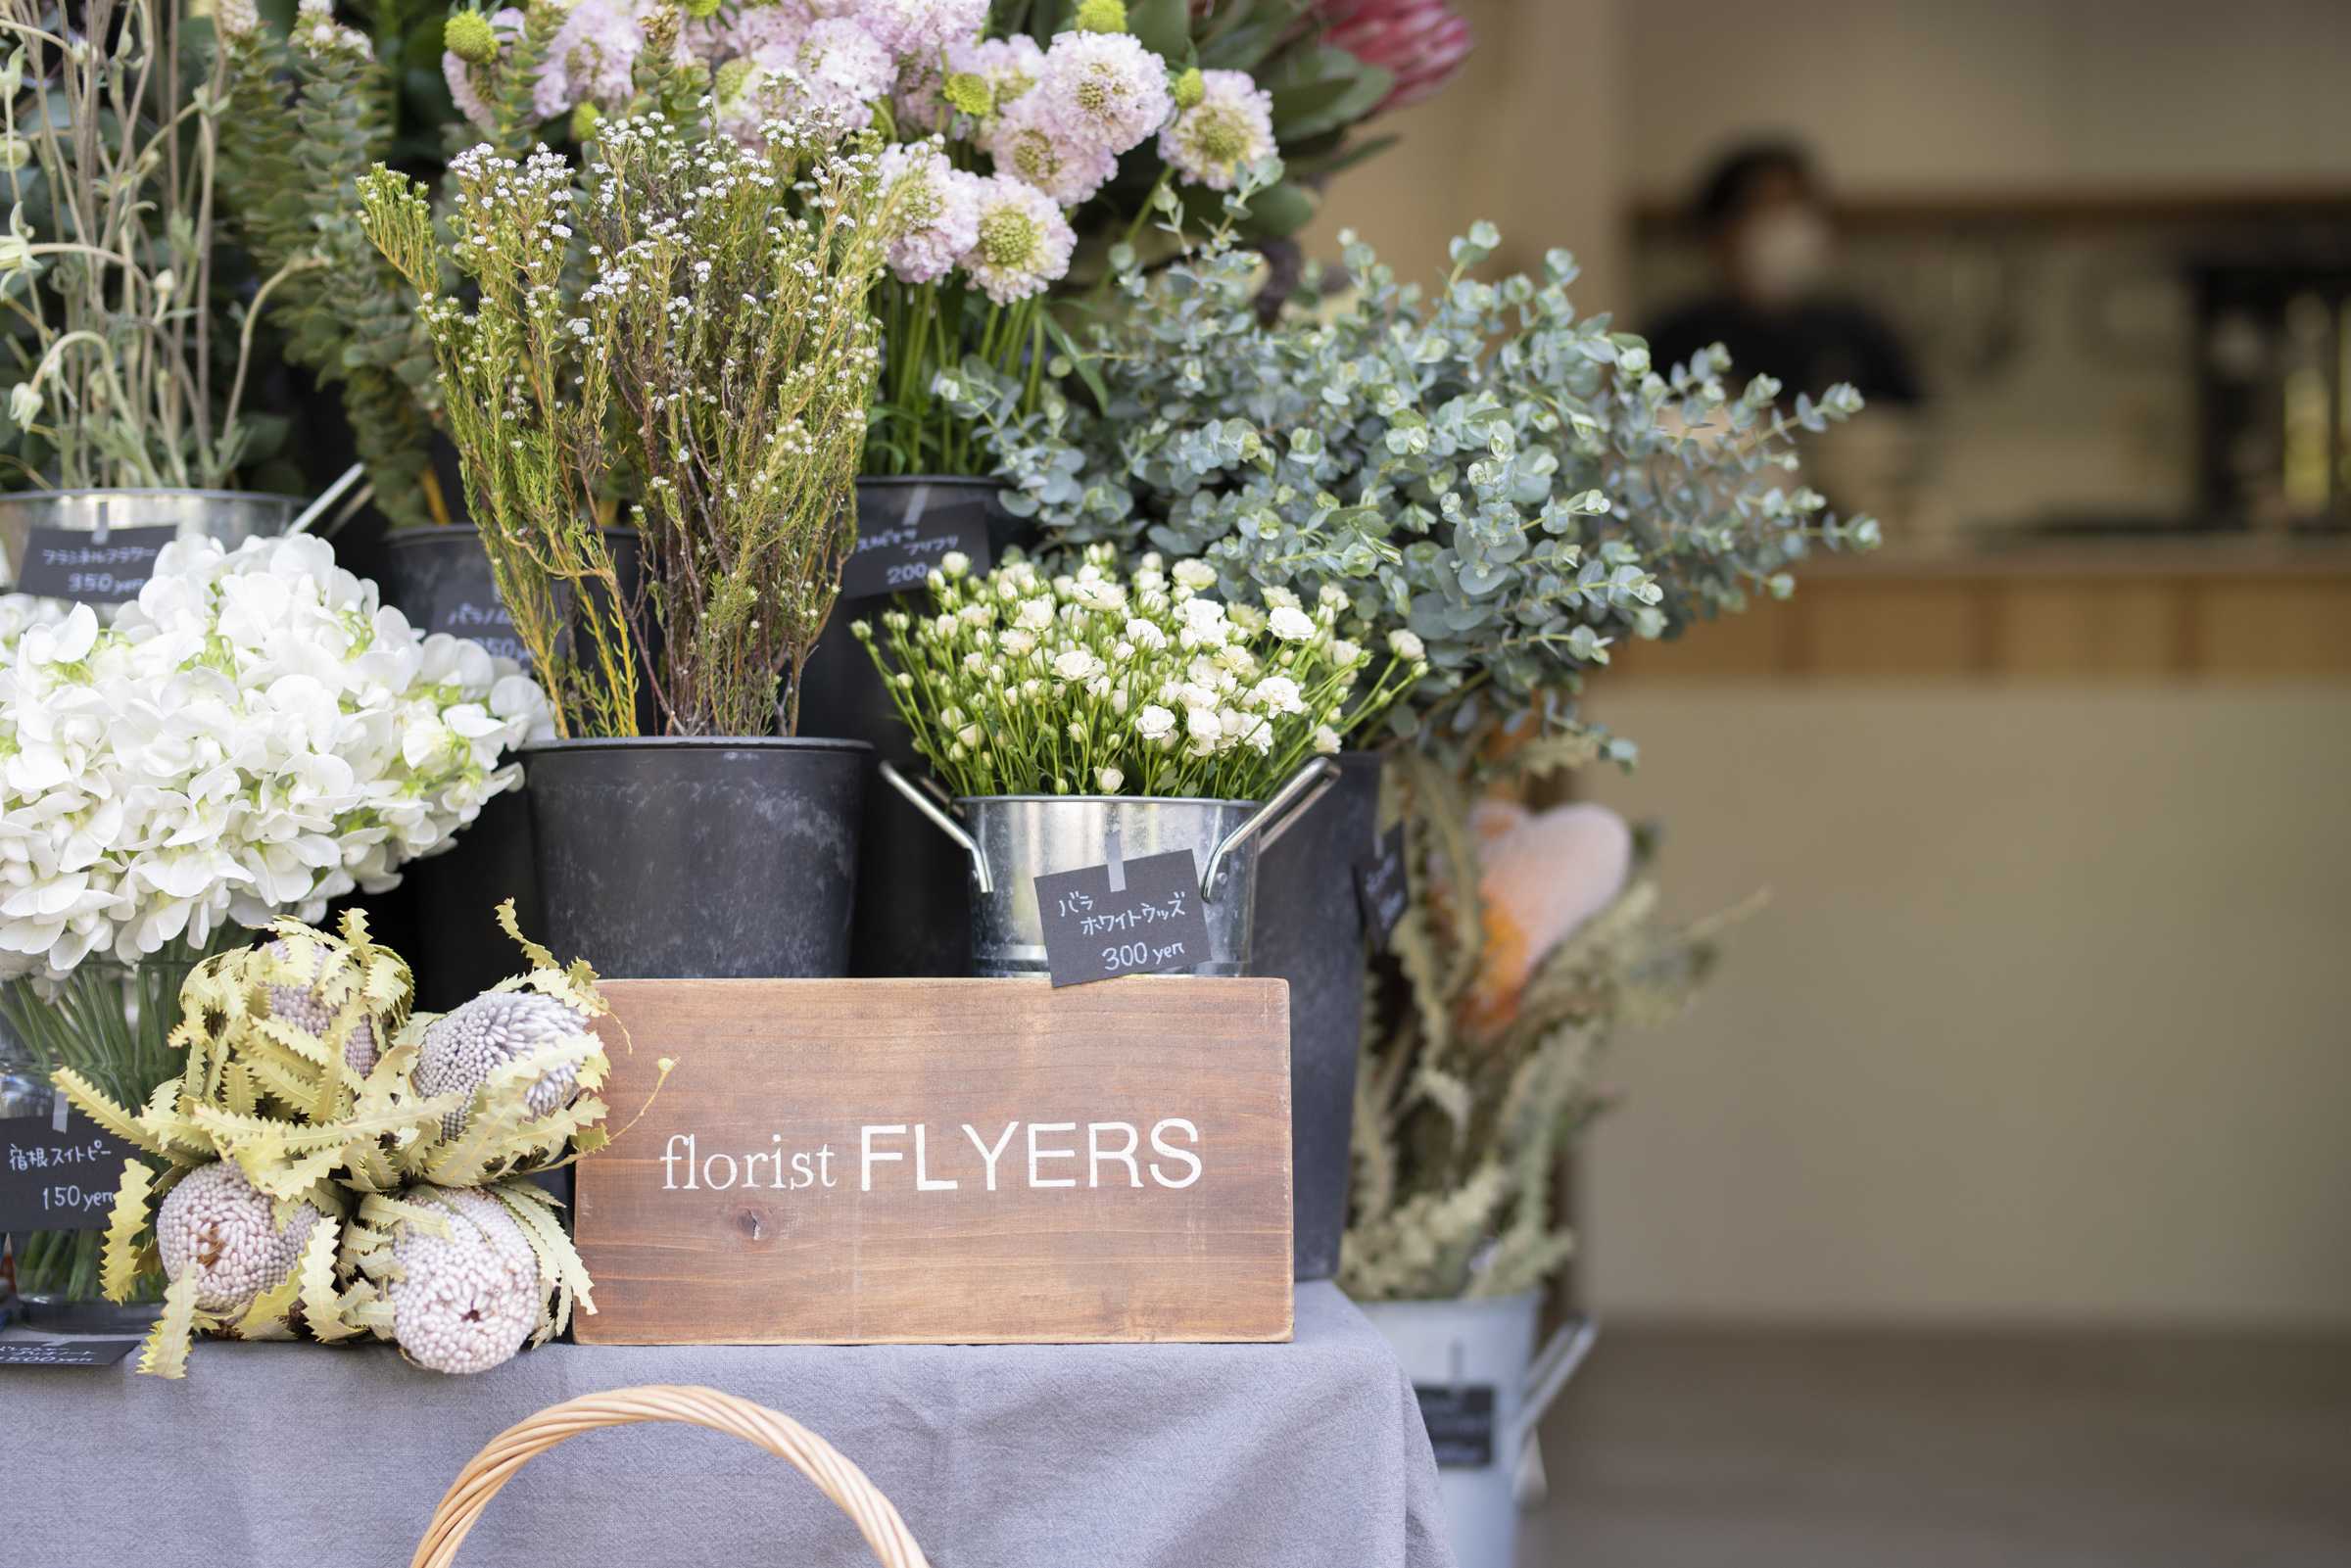 02_florist_fryers